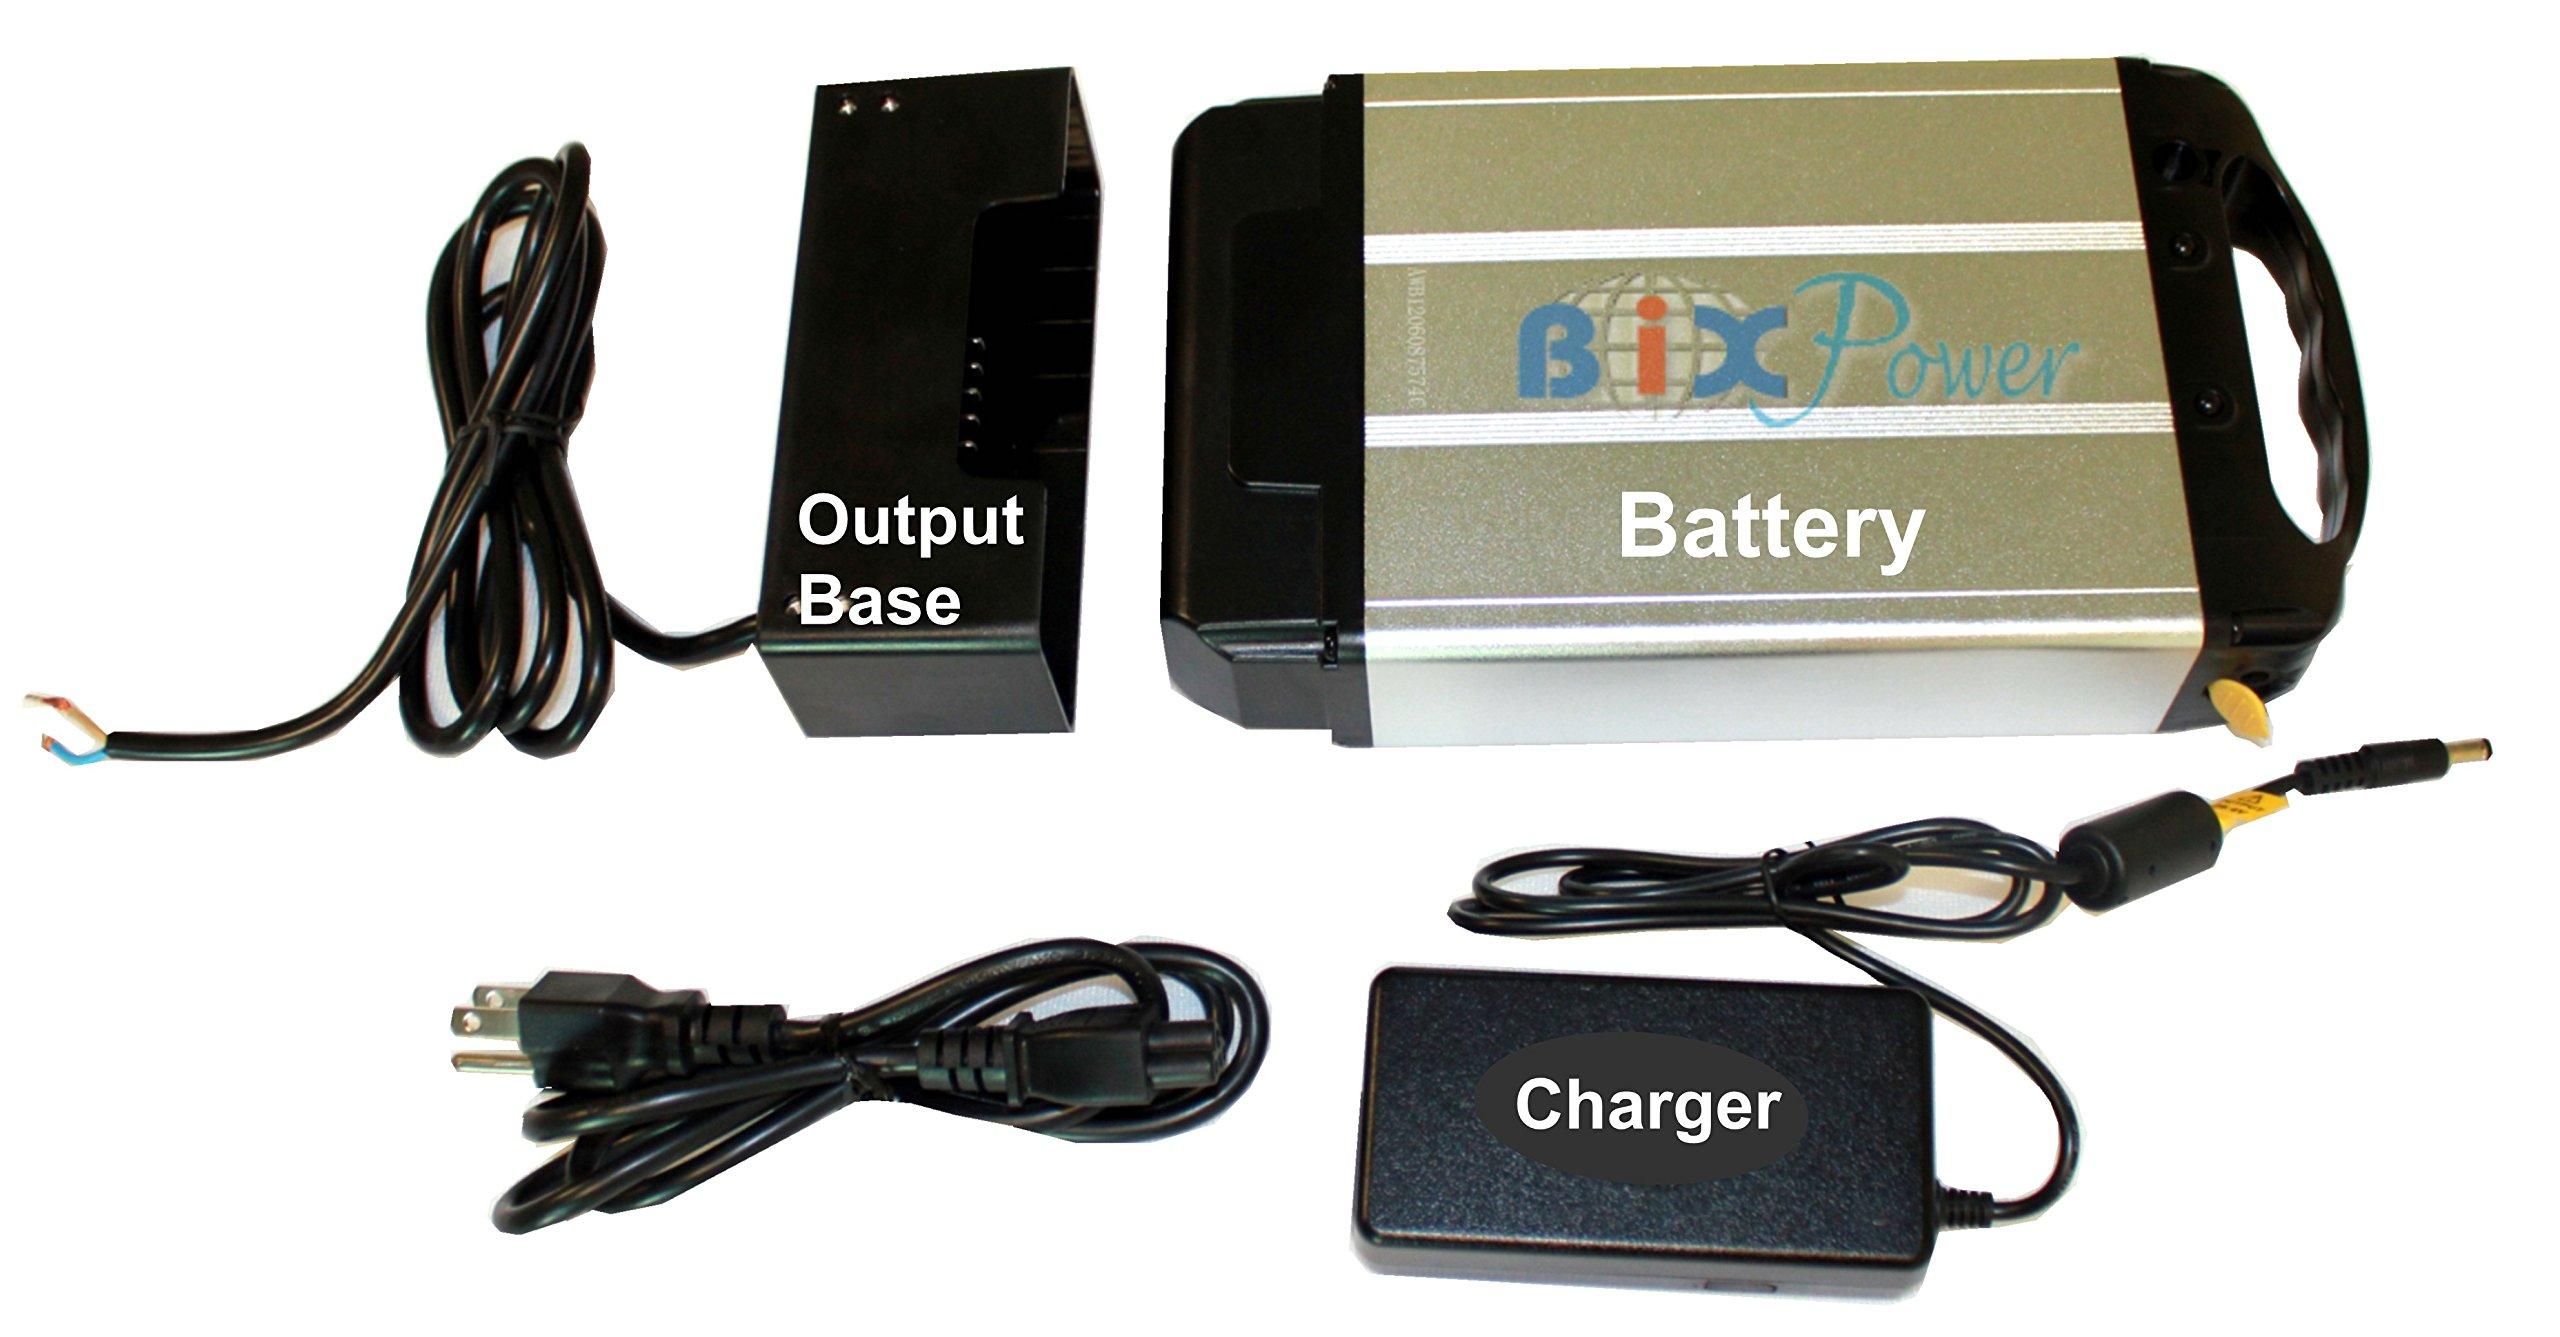 BiXPower 24V 12Ah ( 288 Watt-hour) High Capacity Light Weight Lithium Ion Electric Bicycle E-Bike Battery Pack -BiXPower BX2493H